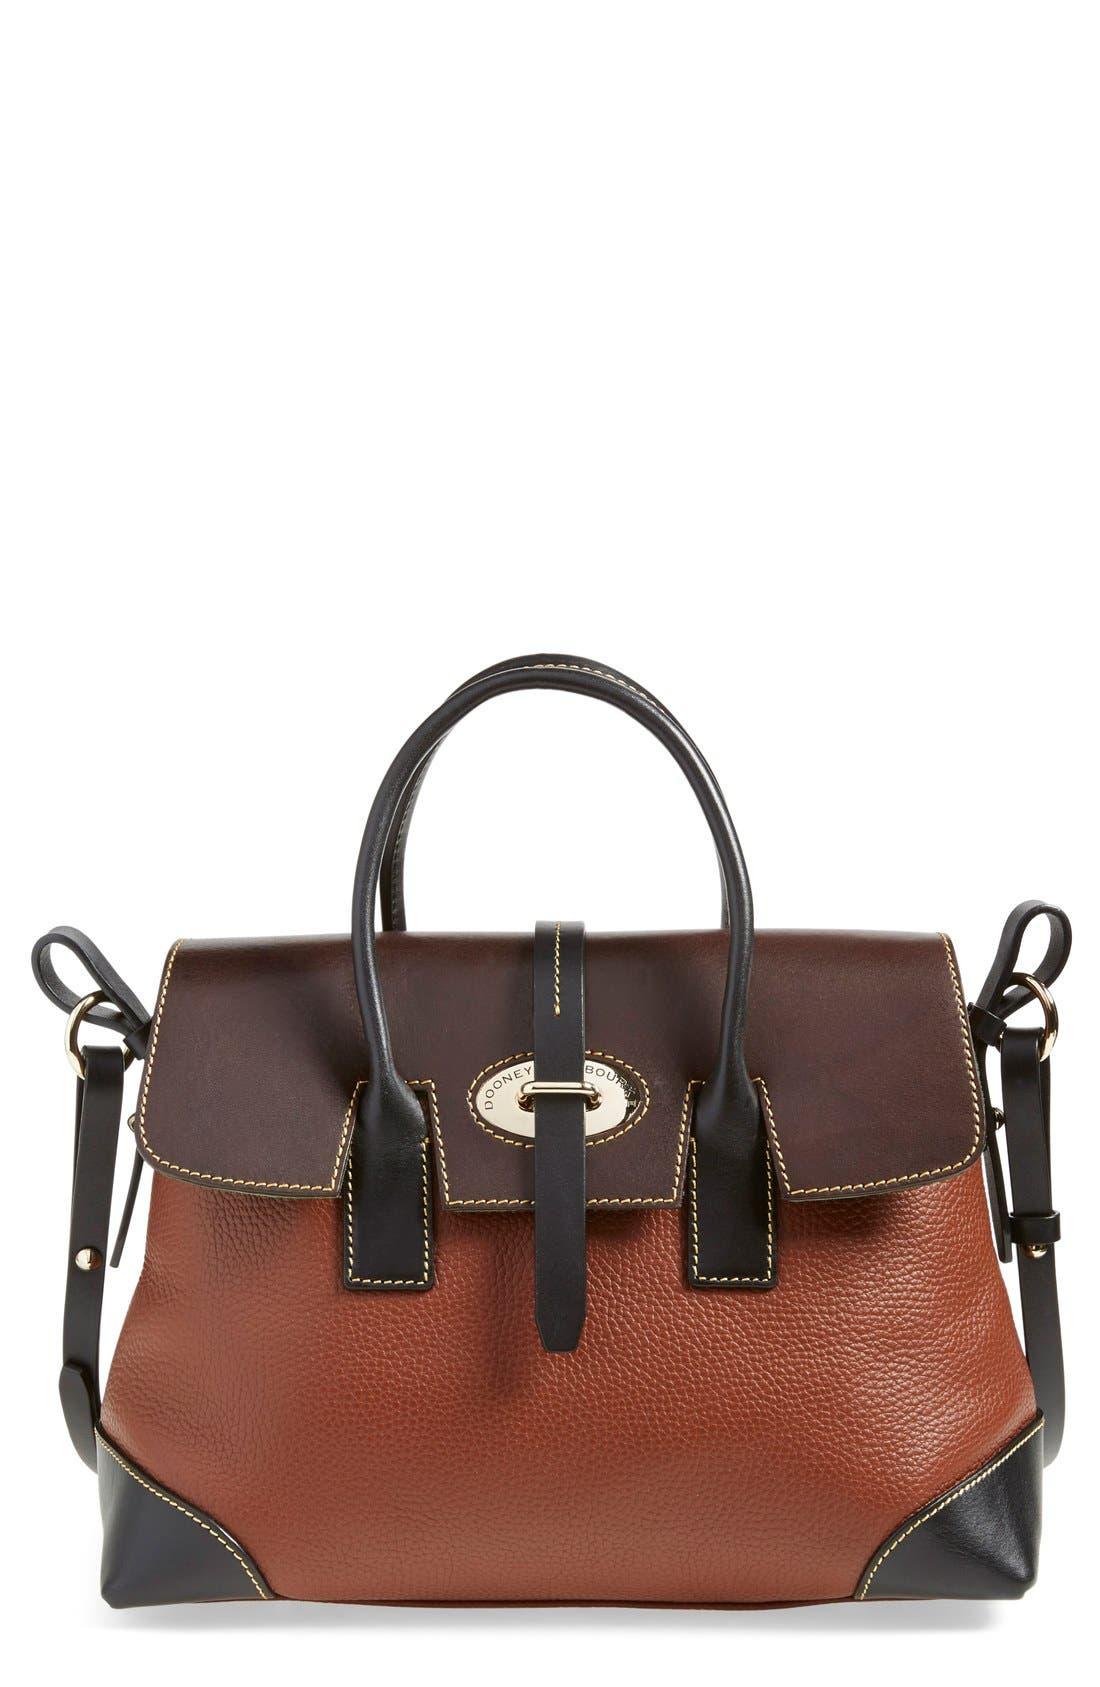 Alternate Image 1 Selected - Dooney & Bourke 'Verona Large Elisa' Grained Leather Satchel